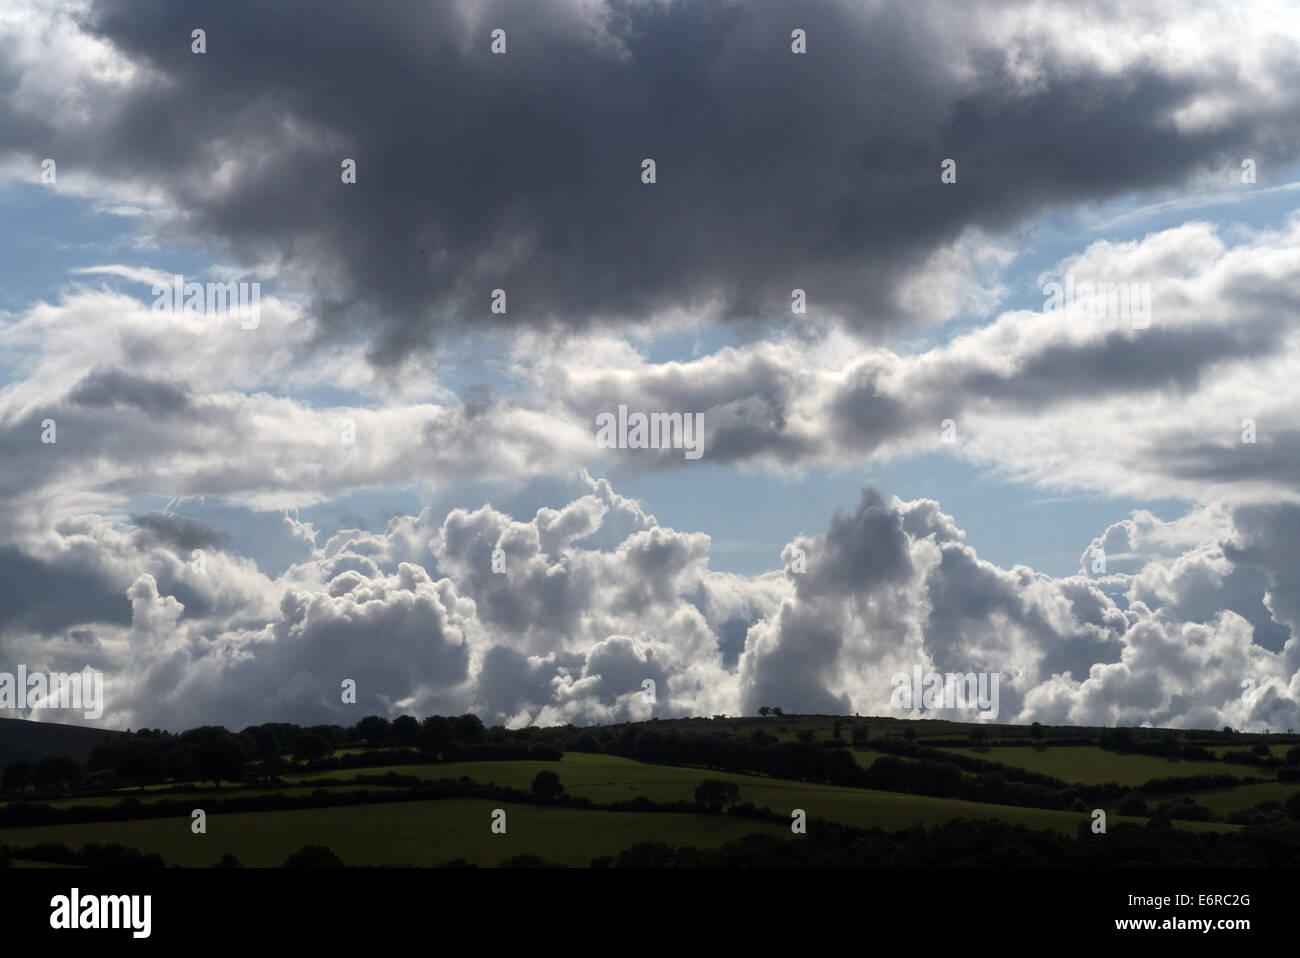 Cumulonimbus clouds over Exmoor, Somerset, England - Stock Image